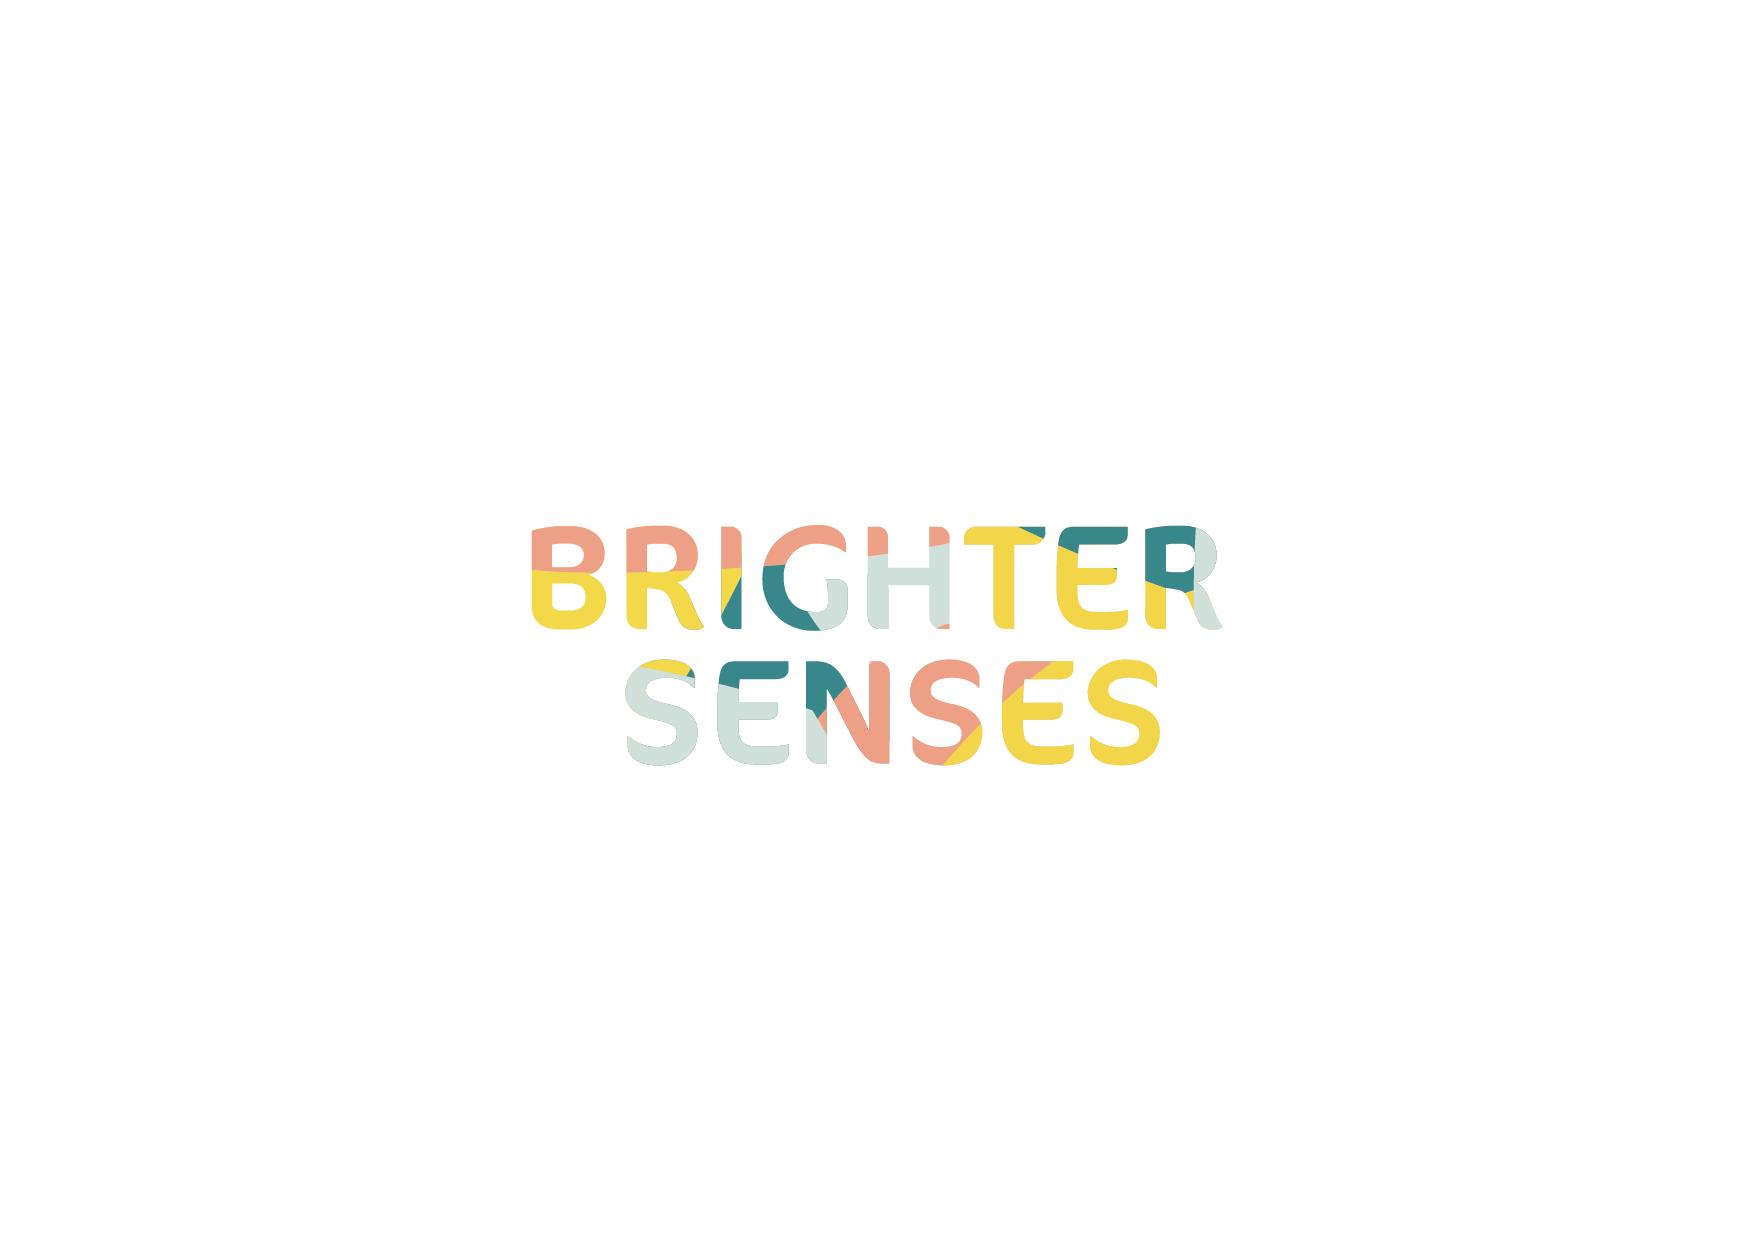 A logo design that says brighter senses